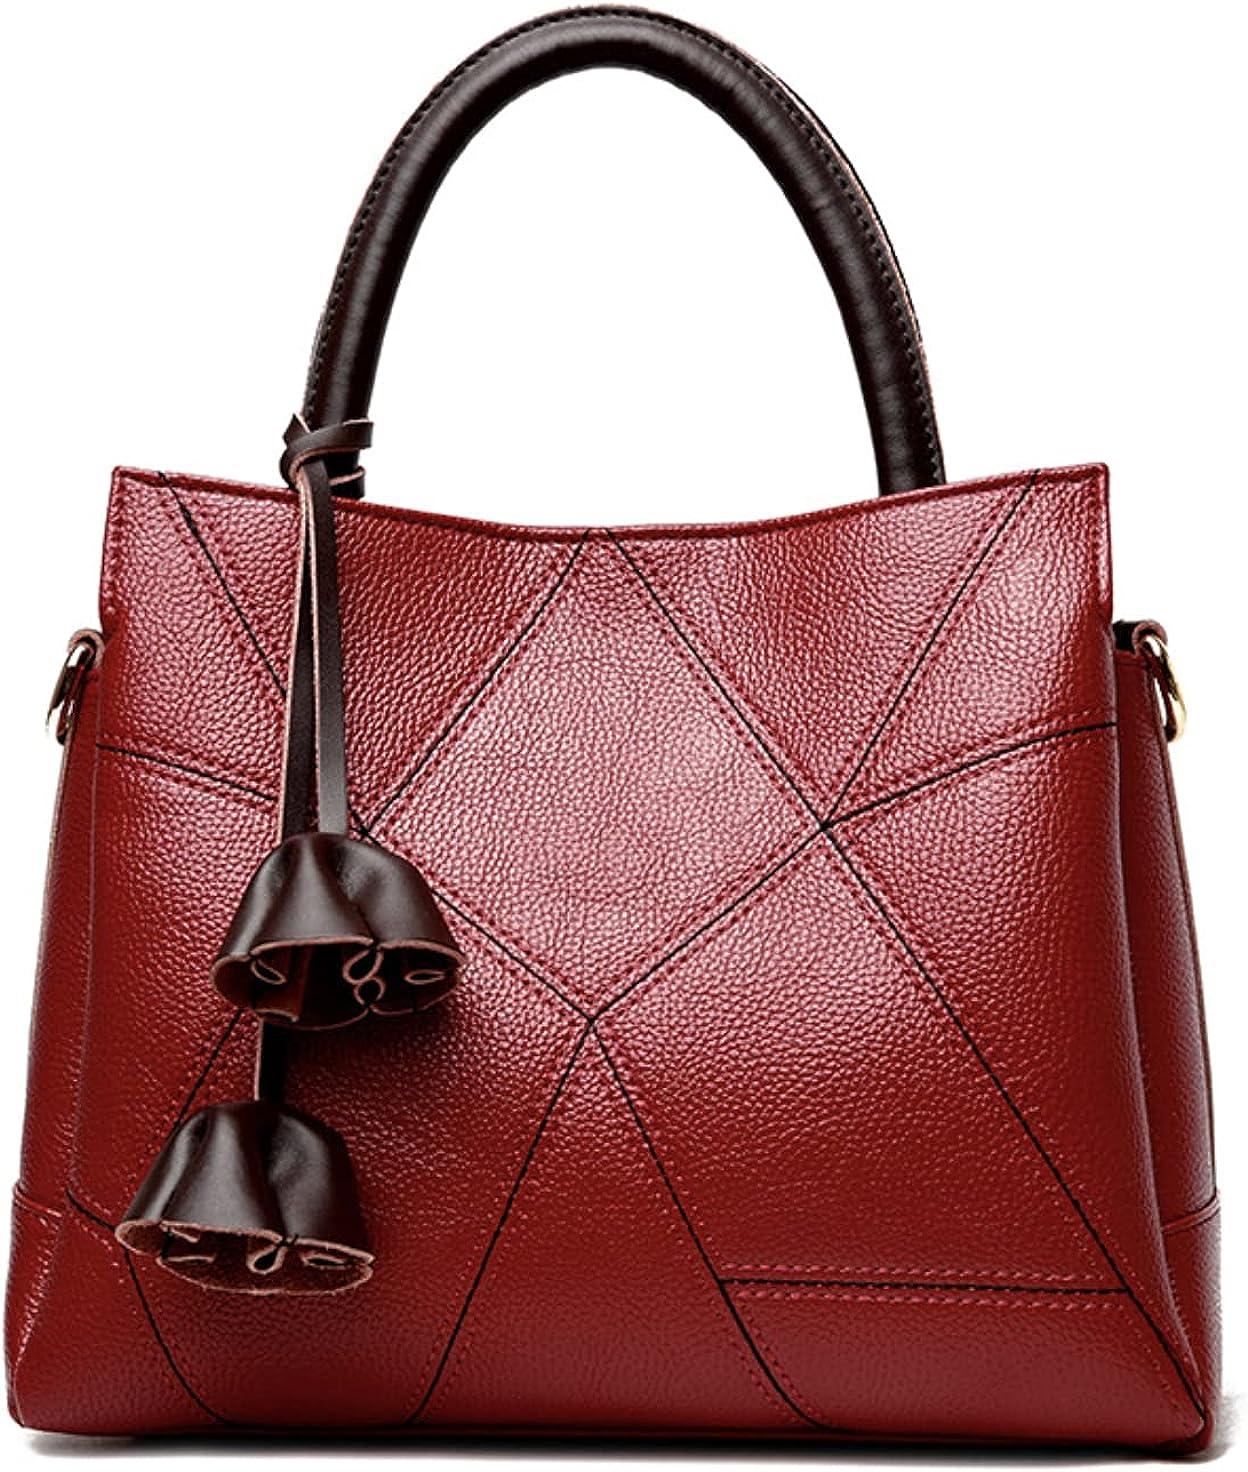 AMEGANVIK Seasonal Wrap Introduction Purses and Handbags Manufacturer OFFicial shop for Desig Tote Women Satchels Bags